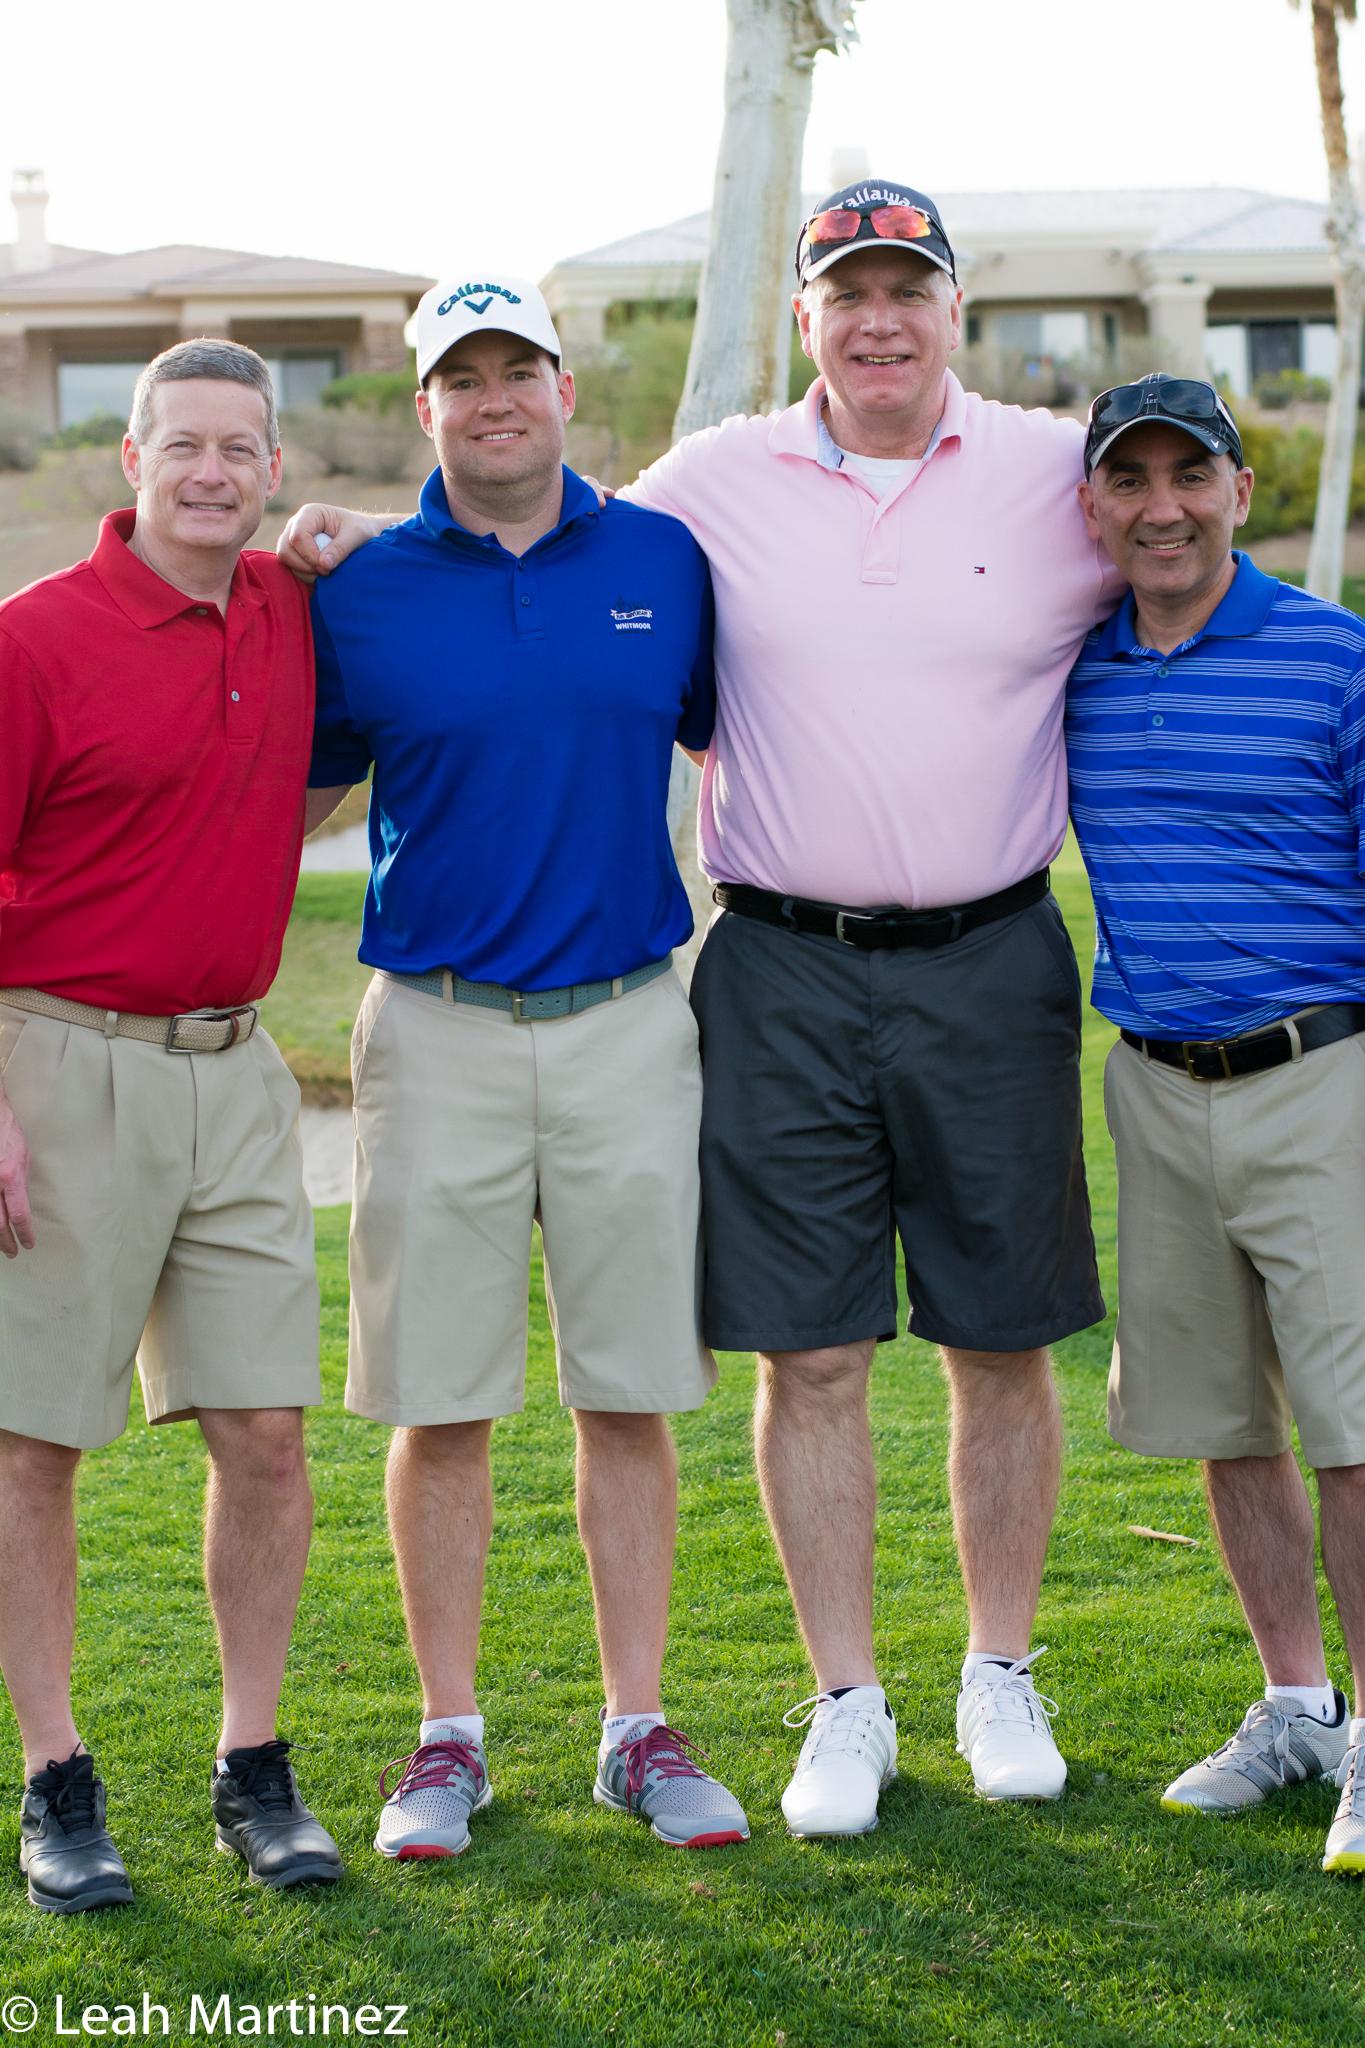 2016 Golden Golf Challenge - Las Vegas, NV